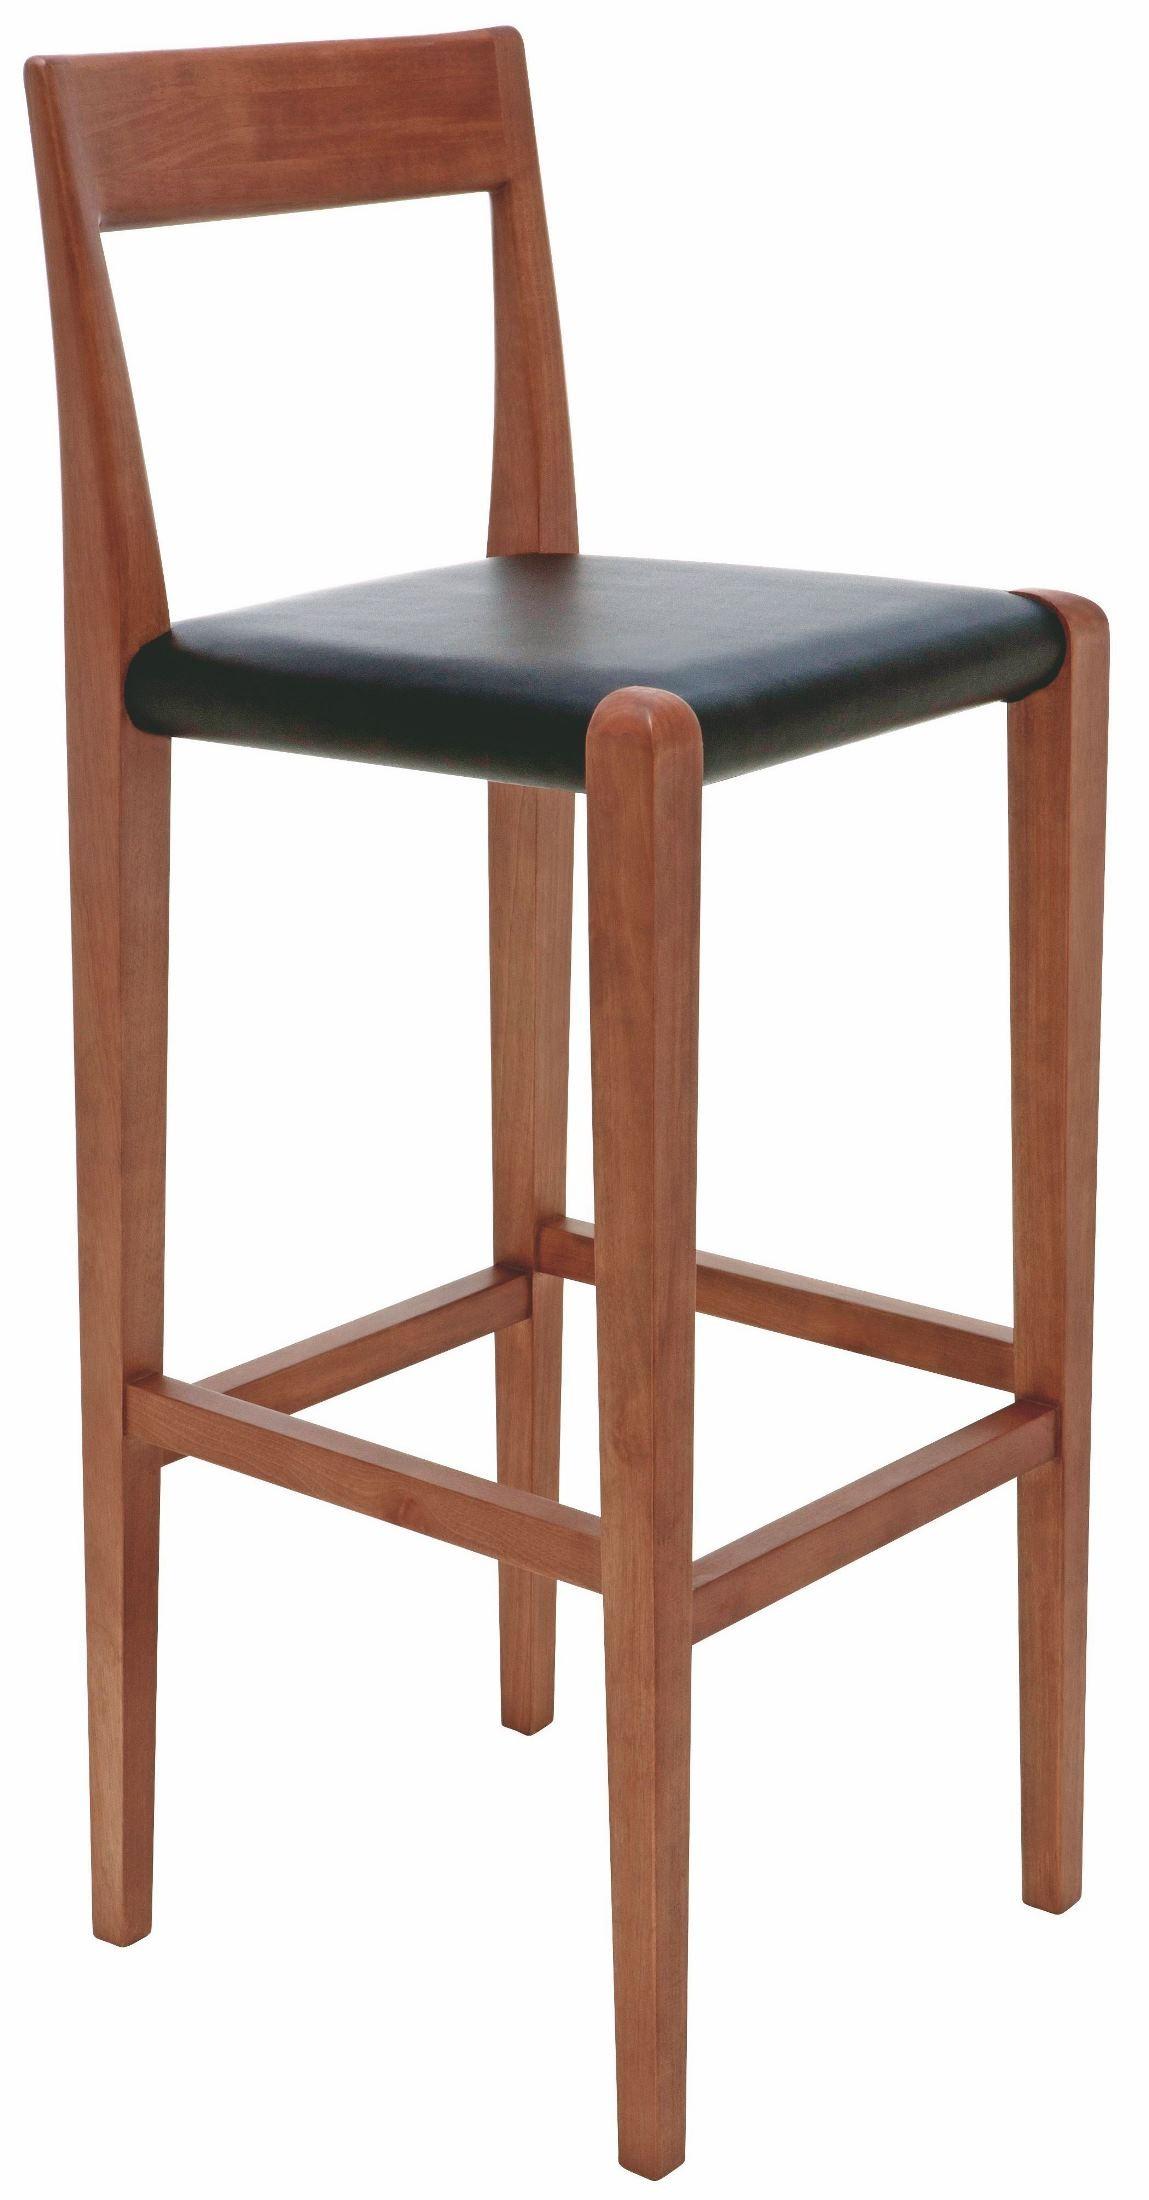 Ameri Black Leather Bar Stool From Nuevo Coleman Furniture